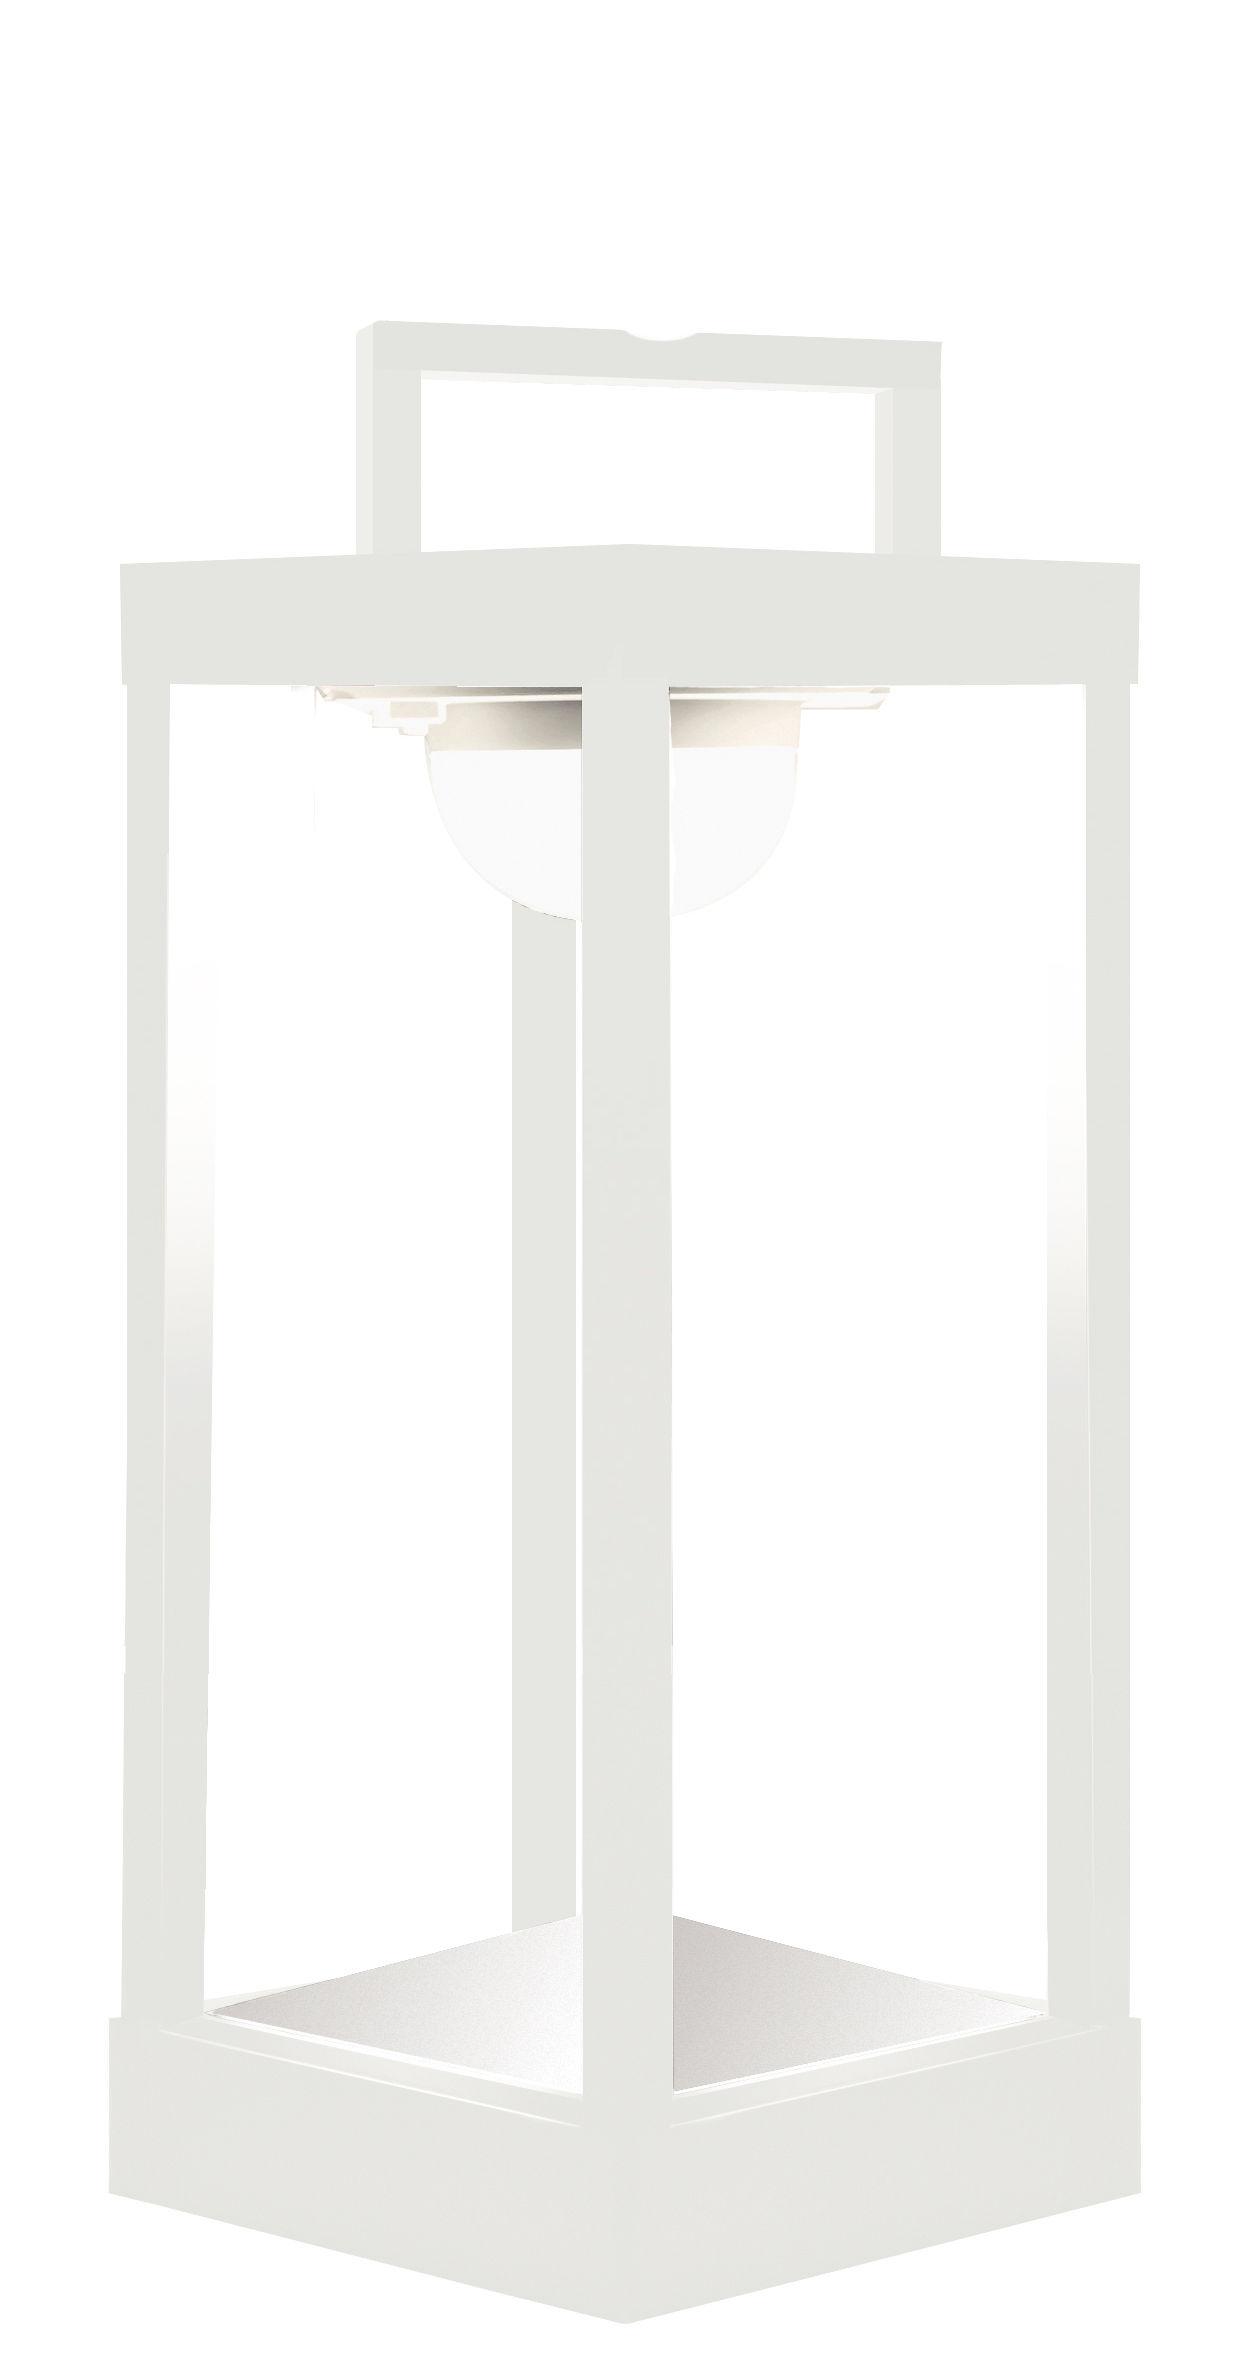 Lighting - Table Lamps - La Lampe Parc M Solar lamp - LED - Wireless - H 40 cm by Maiori - White - Aluminium, Glass